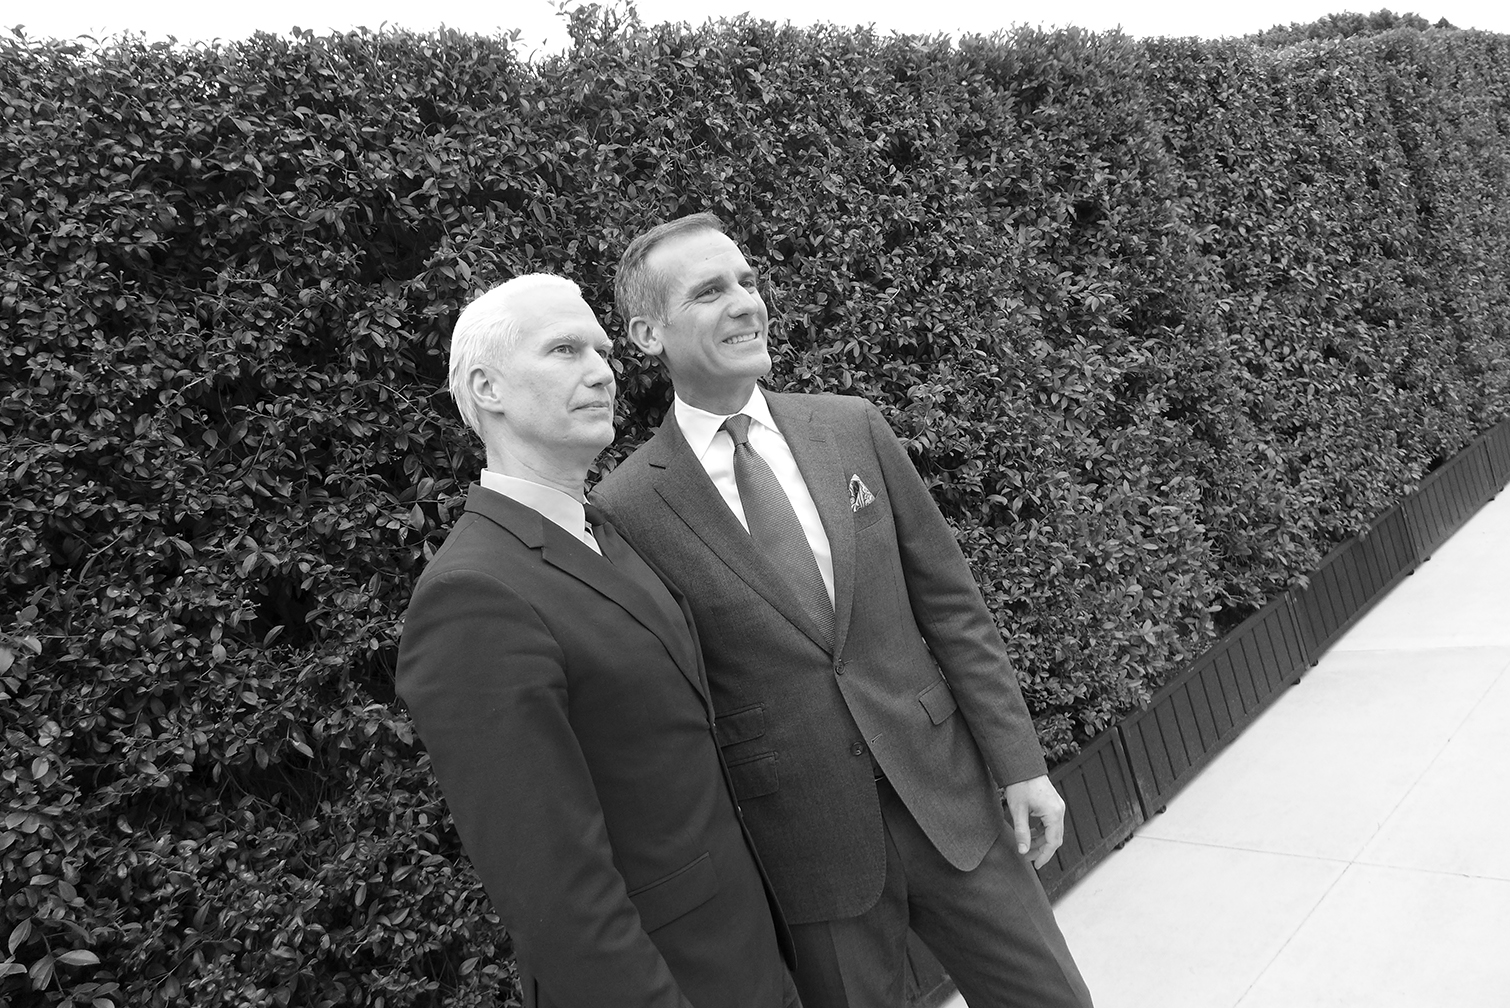 Klaus Biesenbach and Eric Garcetti